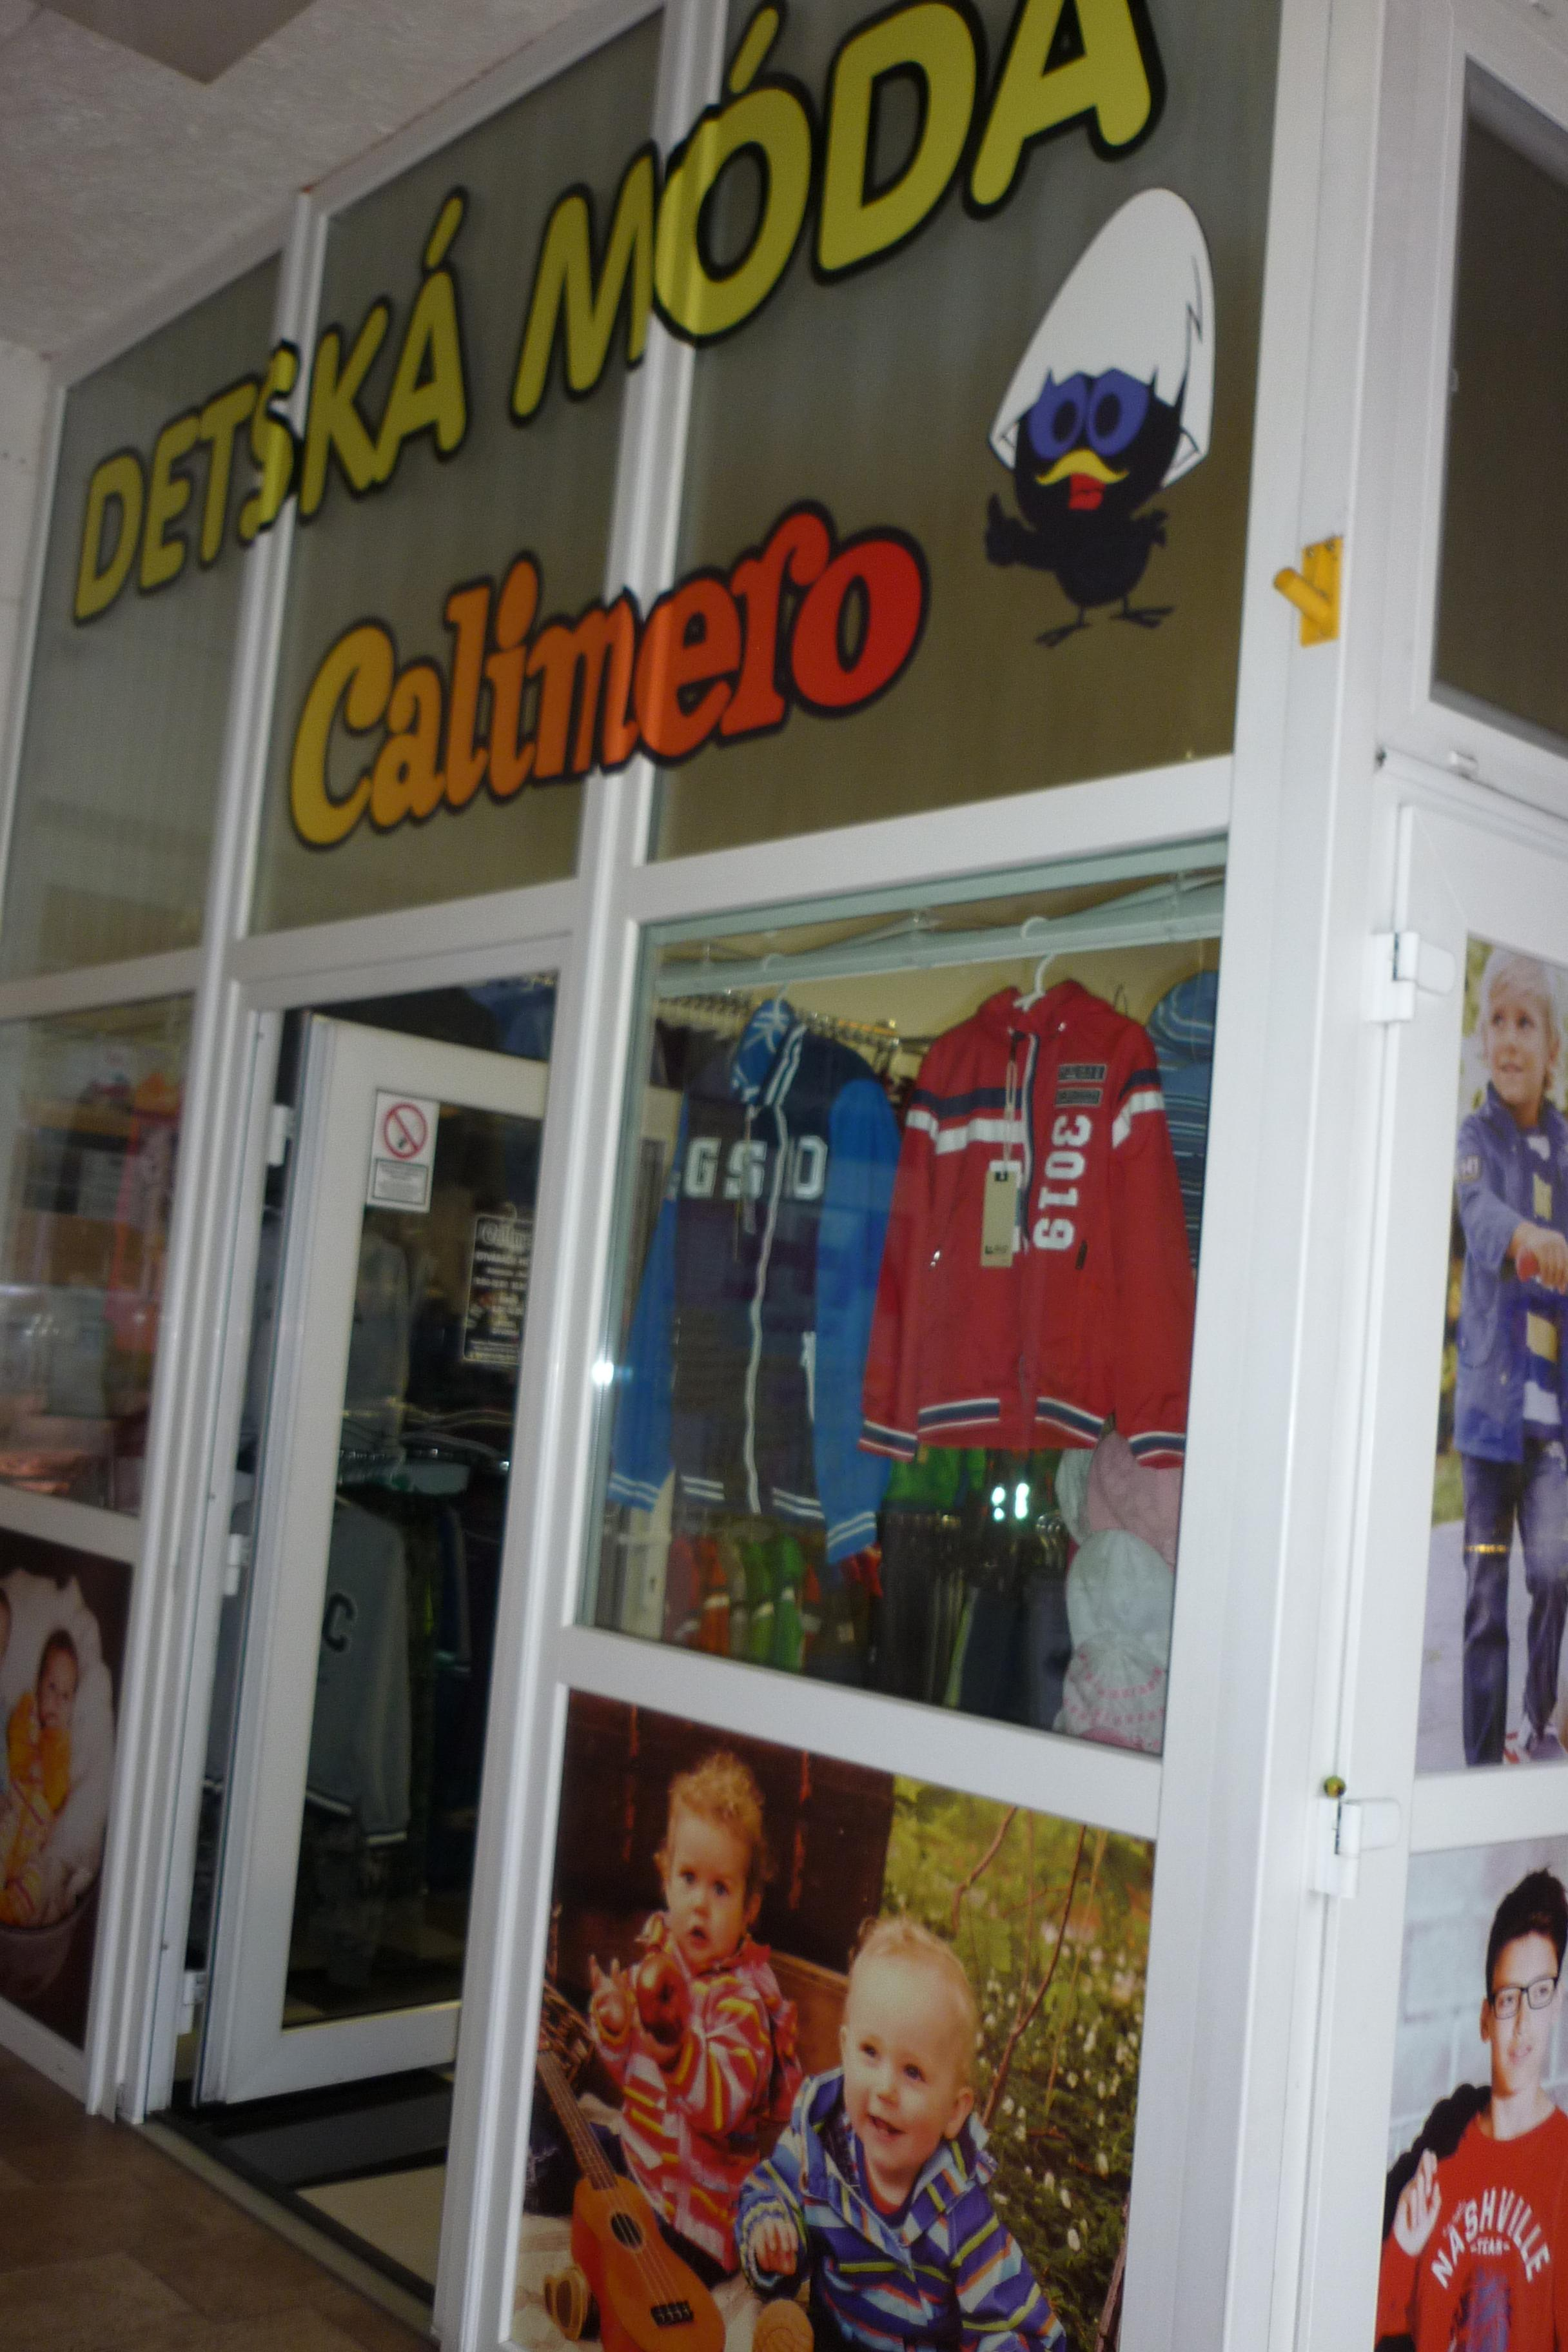 Detská móda CALIMERO Nitra